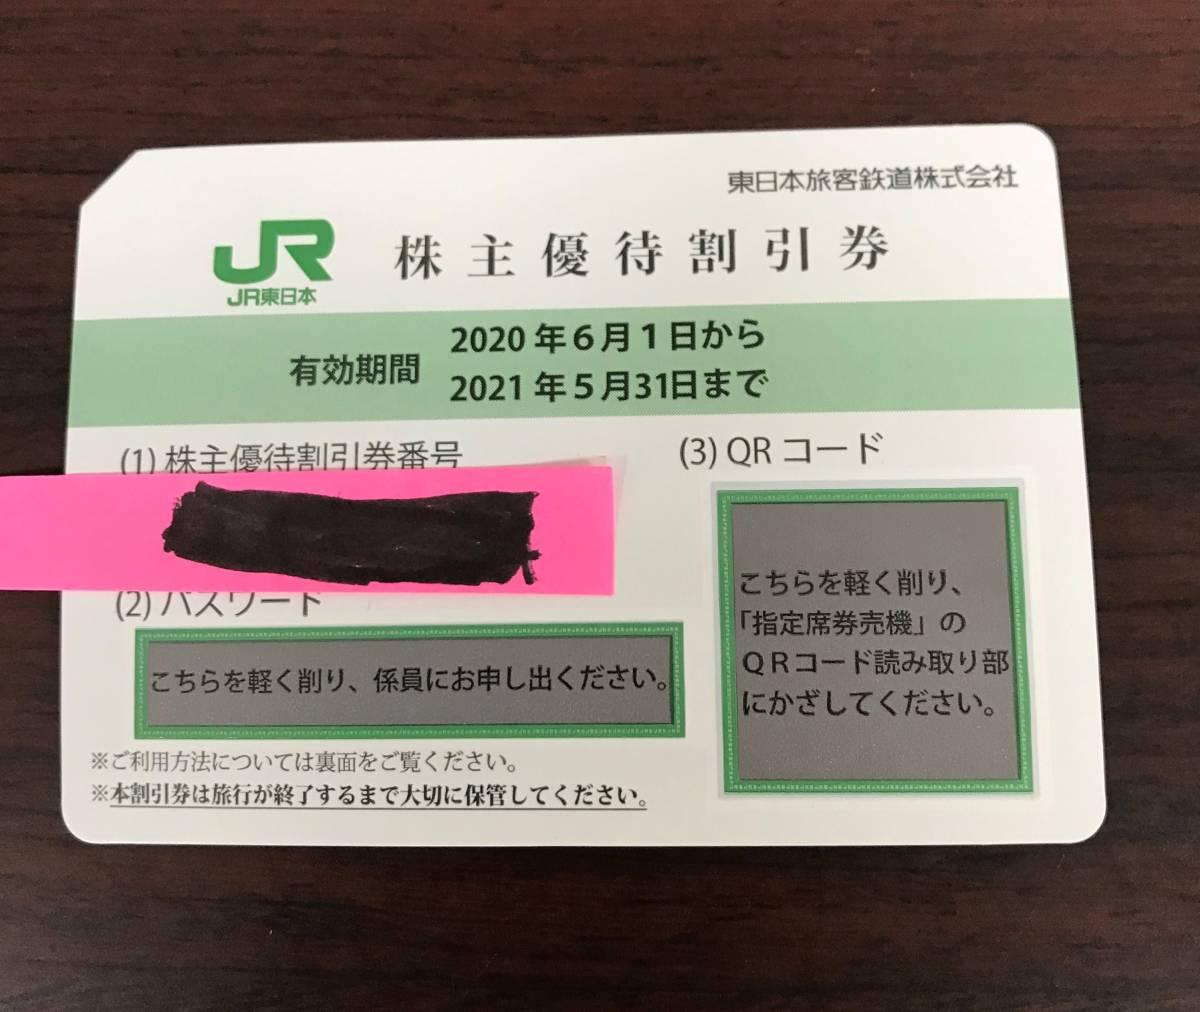 即決 送料無料 JR東日本 株主優待割引券 1枚 2021年5月31日まで_画像1